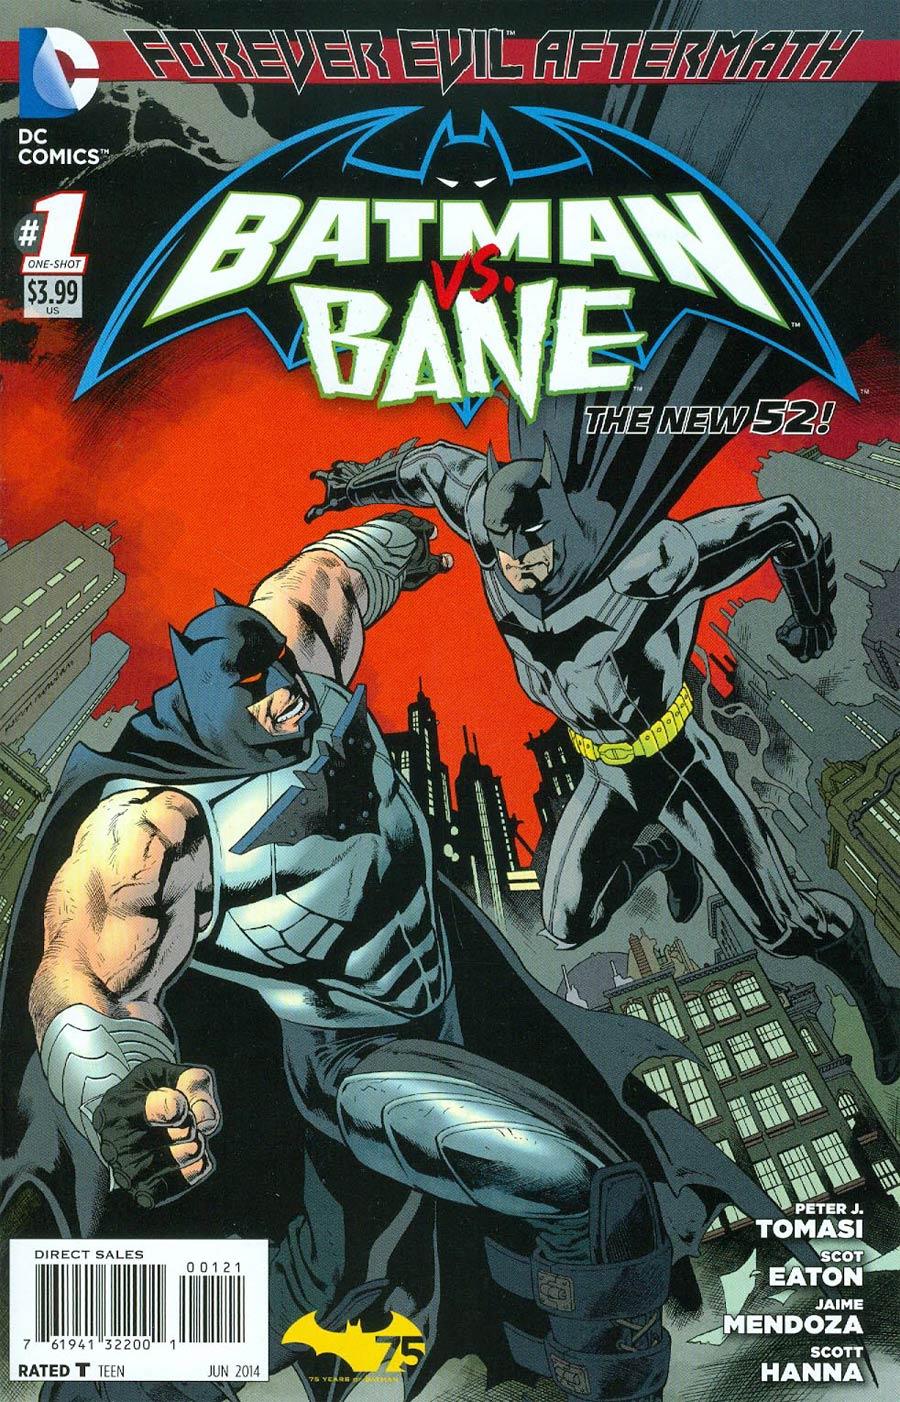 Forever Evil Aftermath Batman vs Bane #1 Cover B Incentive Kevin Nowlan Variant Cover